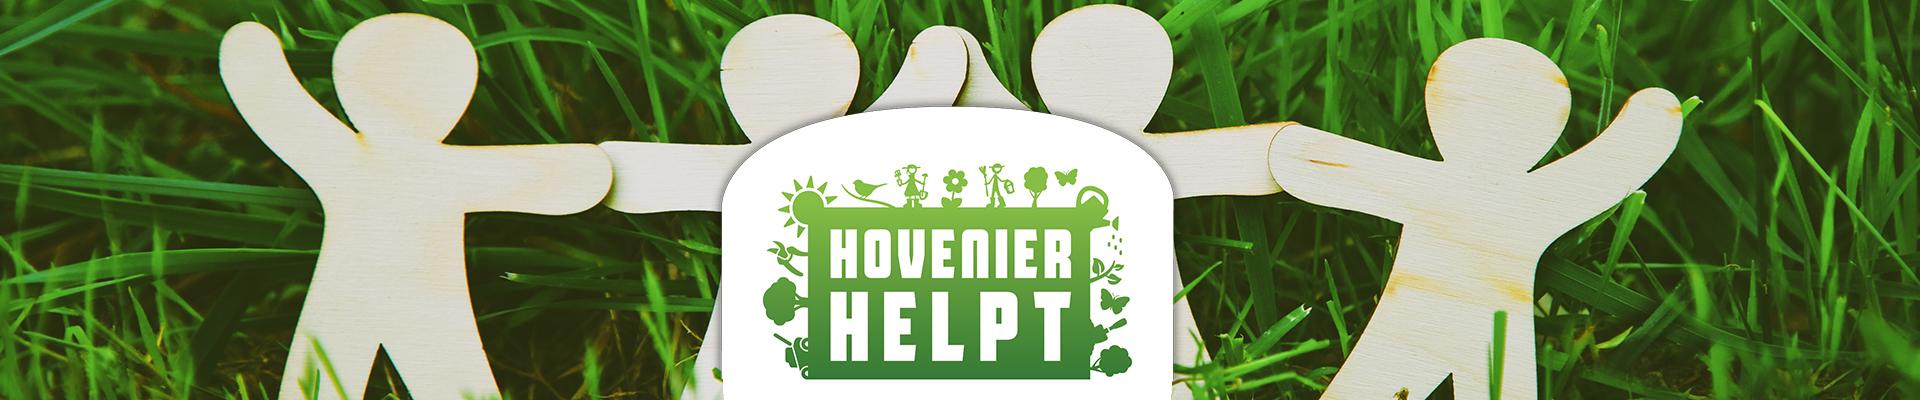 Hovenier Helpt – Samen Nederland groener!